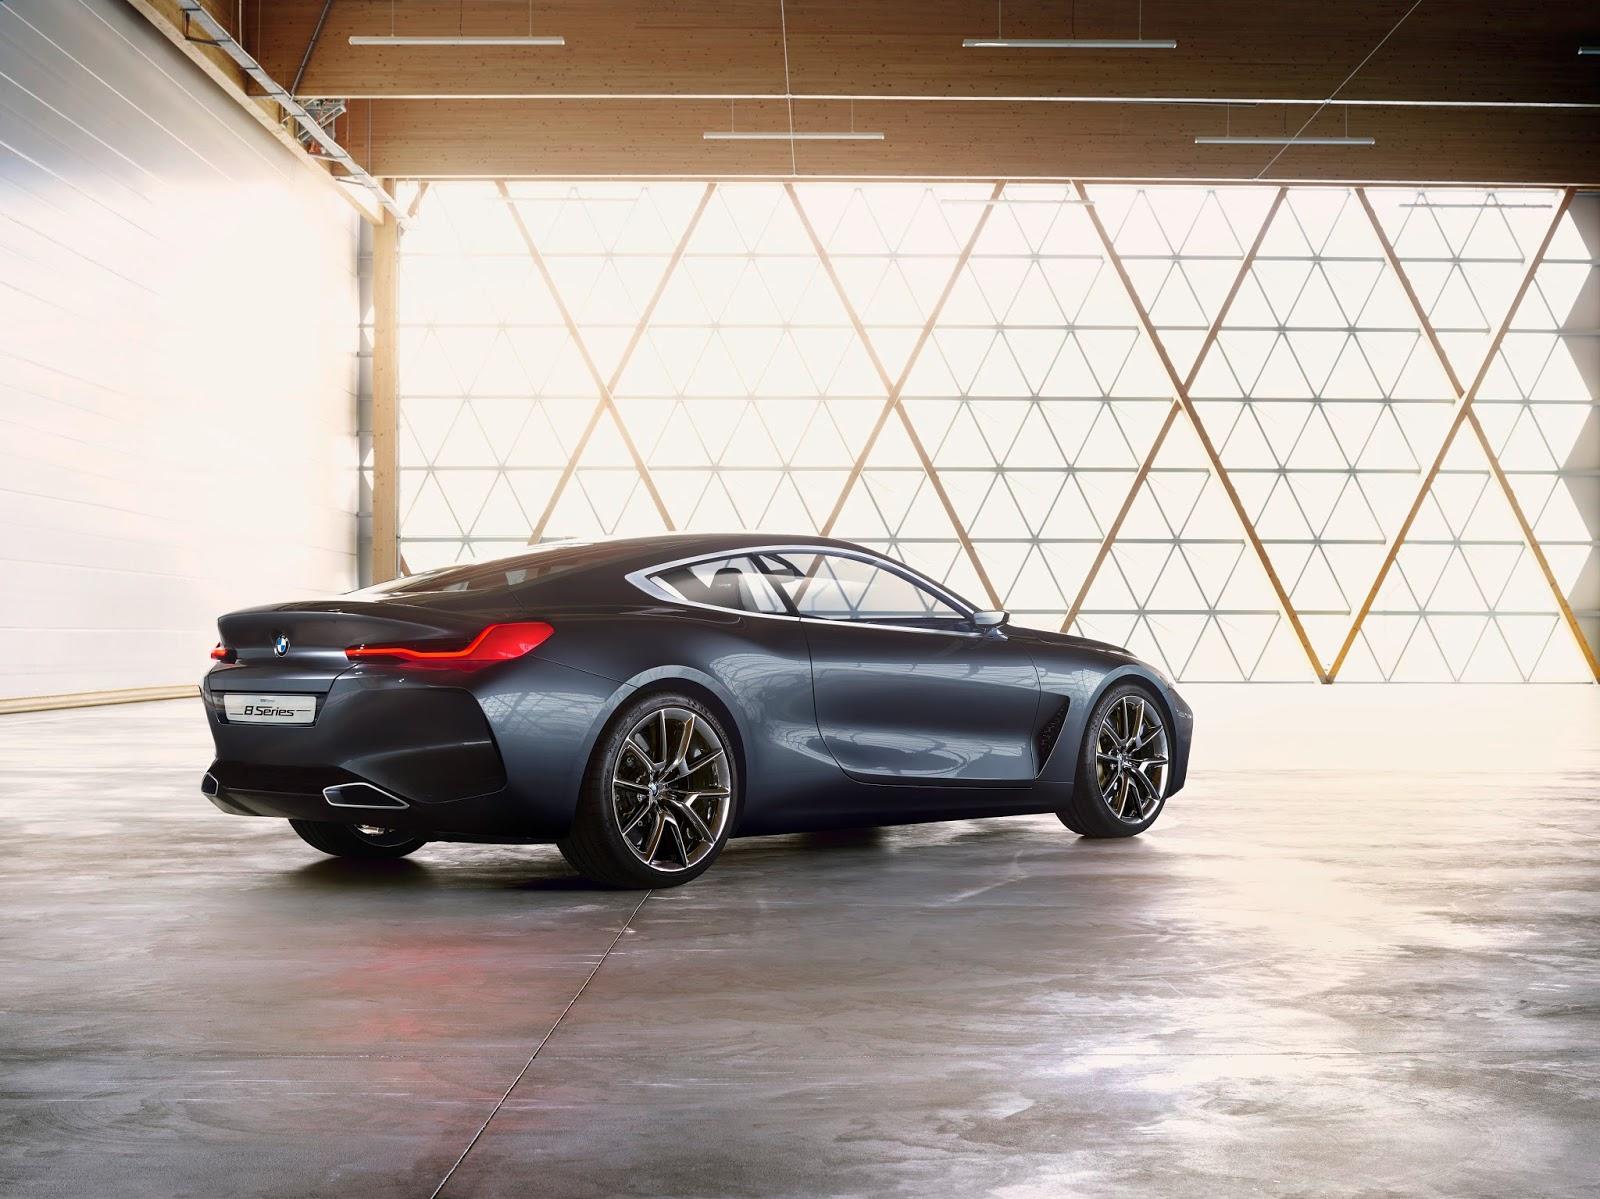 P90261149 highRes bmw concept 8 series Η BMW Σειρά 8 Coupe είναι η πεμπτουσία των μελλοντικών σπορ αυτοκινήτων BMW, BMW 8, BMW Concept, BMW Concept 8 Series, COUPE, dream car